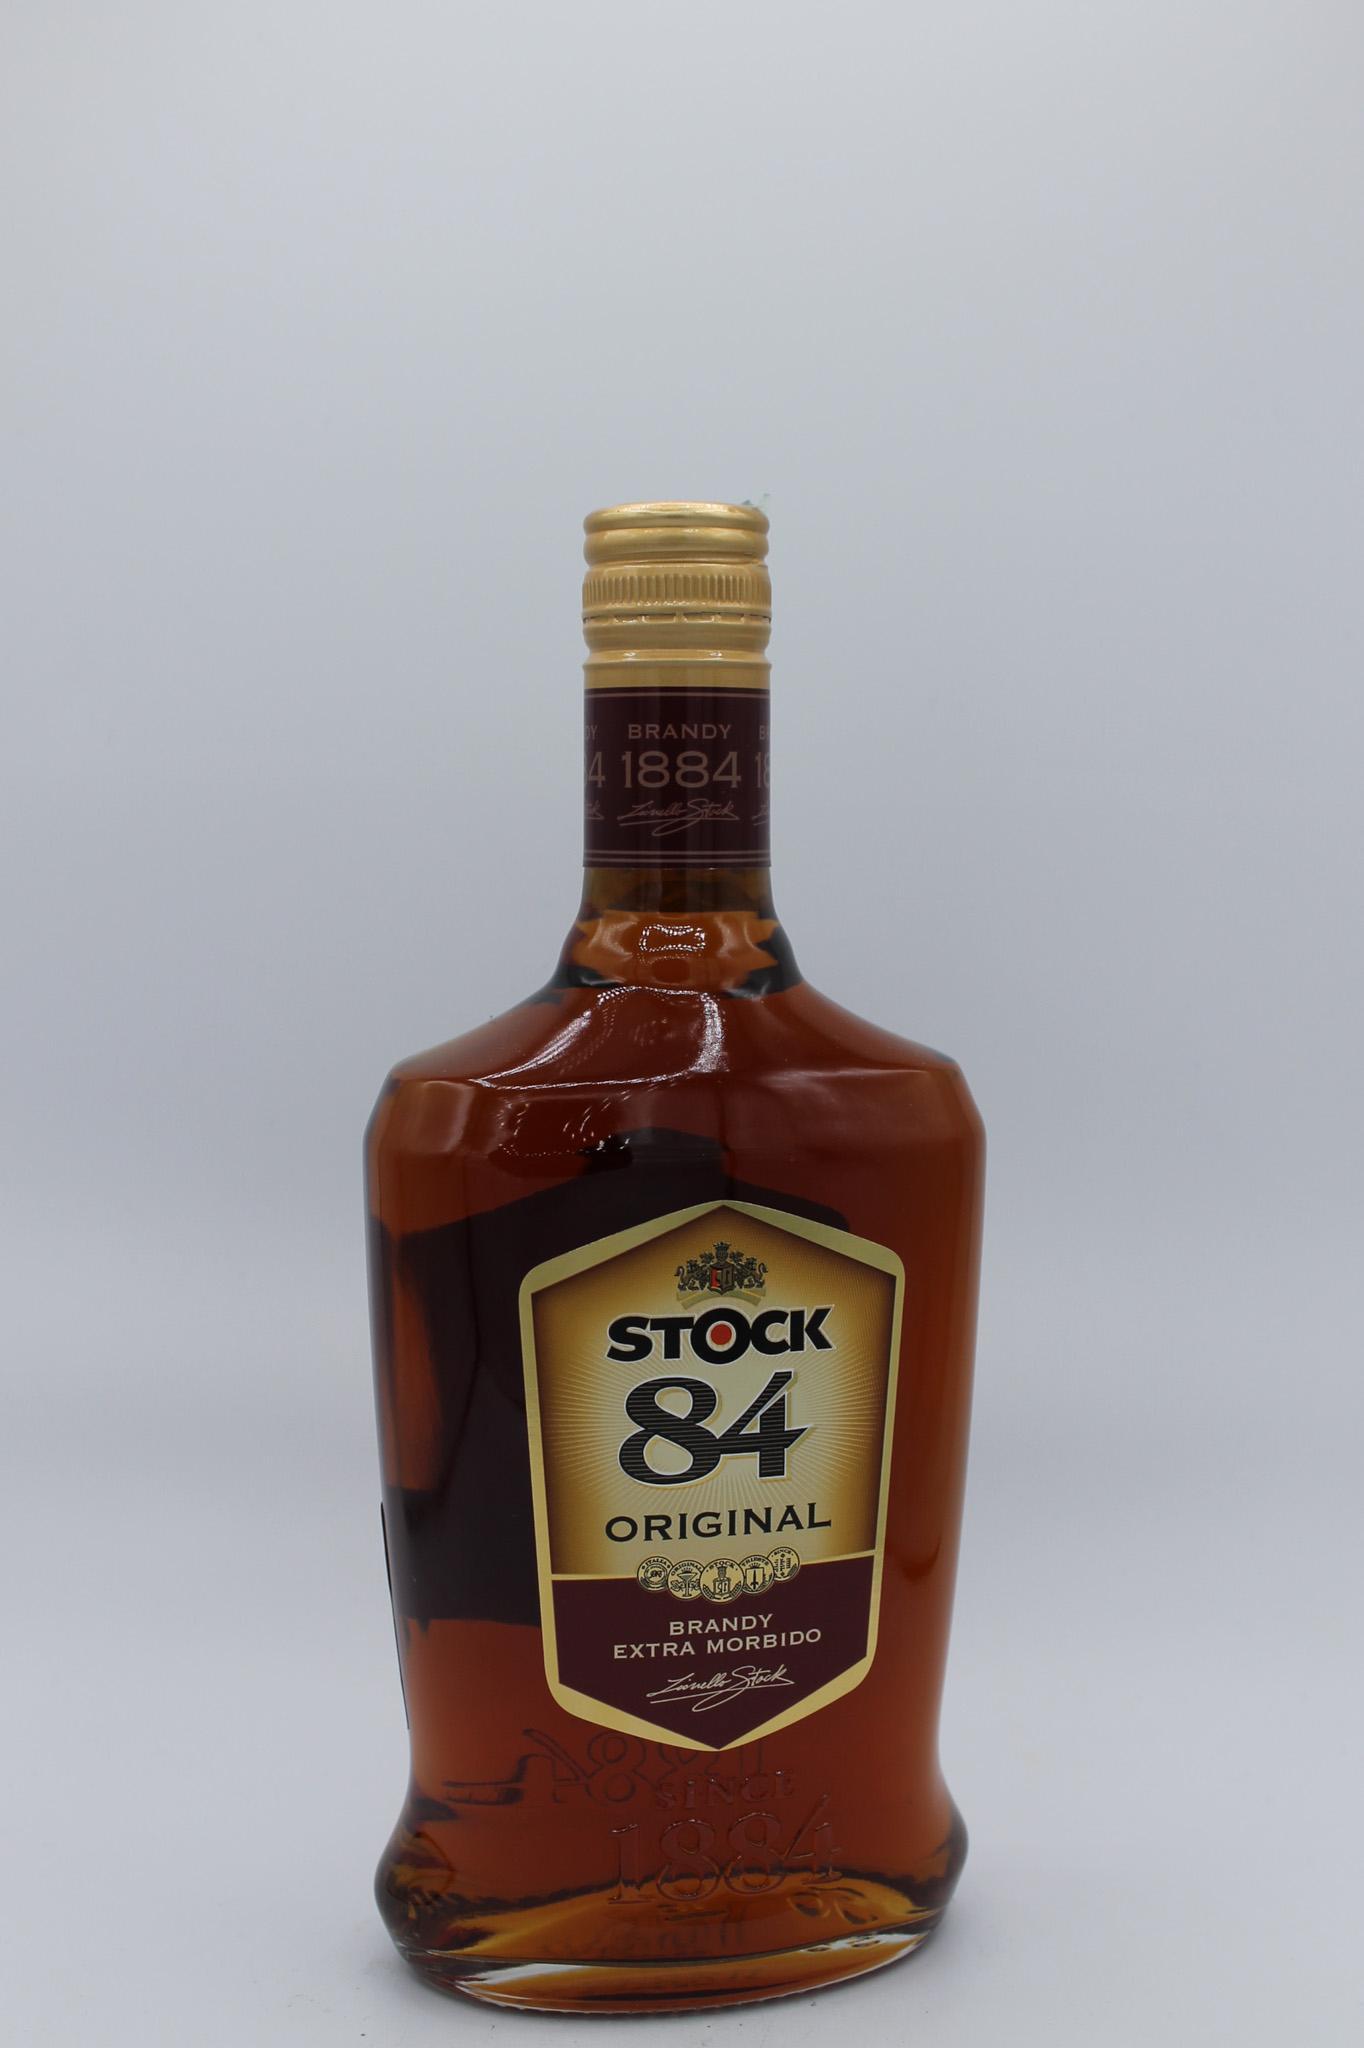 Stock 84 brandy 700ml.